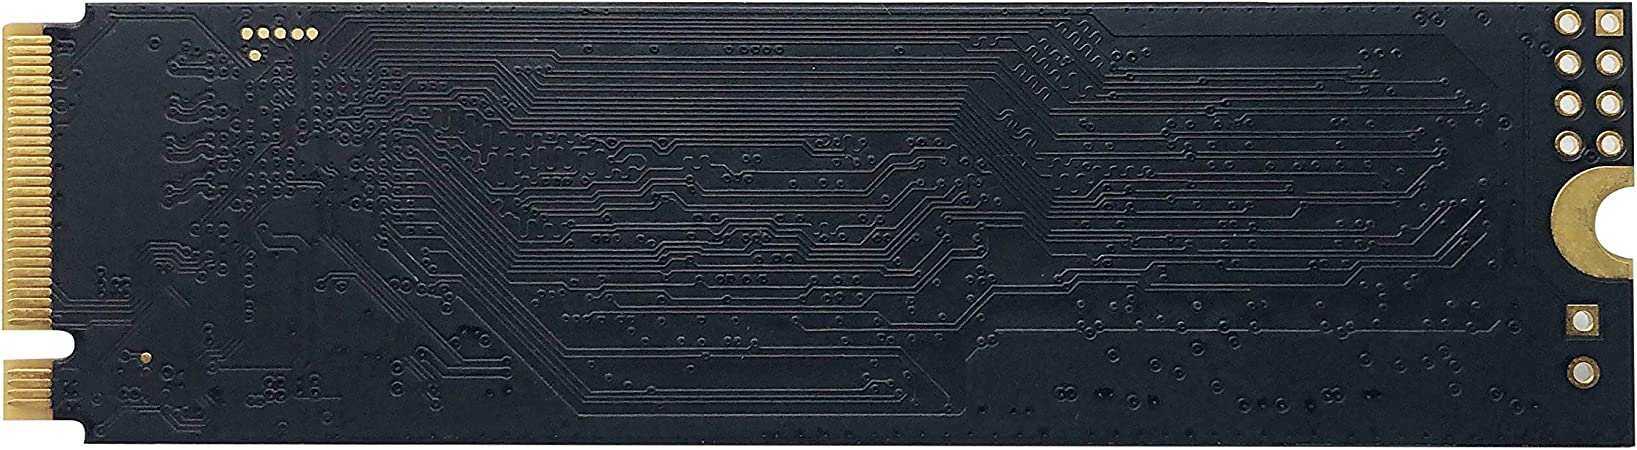 Patriot P300 M 2 Pcie Gen 3 X4 128gb Low Power Ssd Computers Accessories